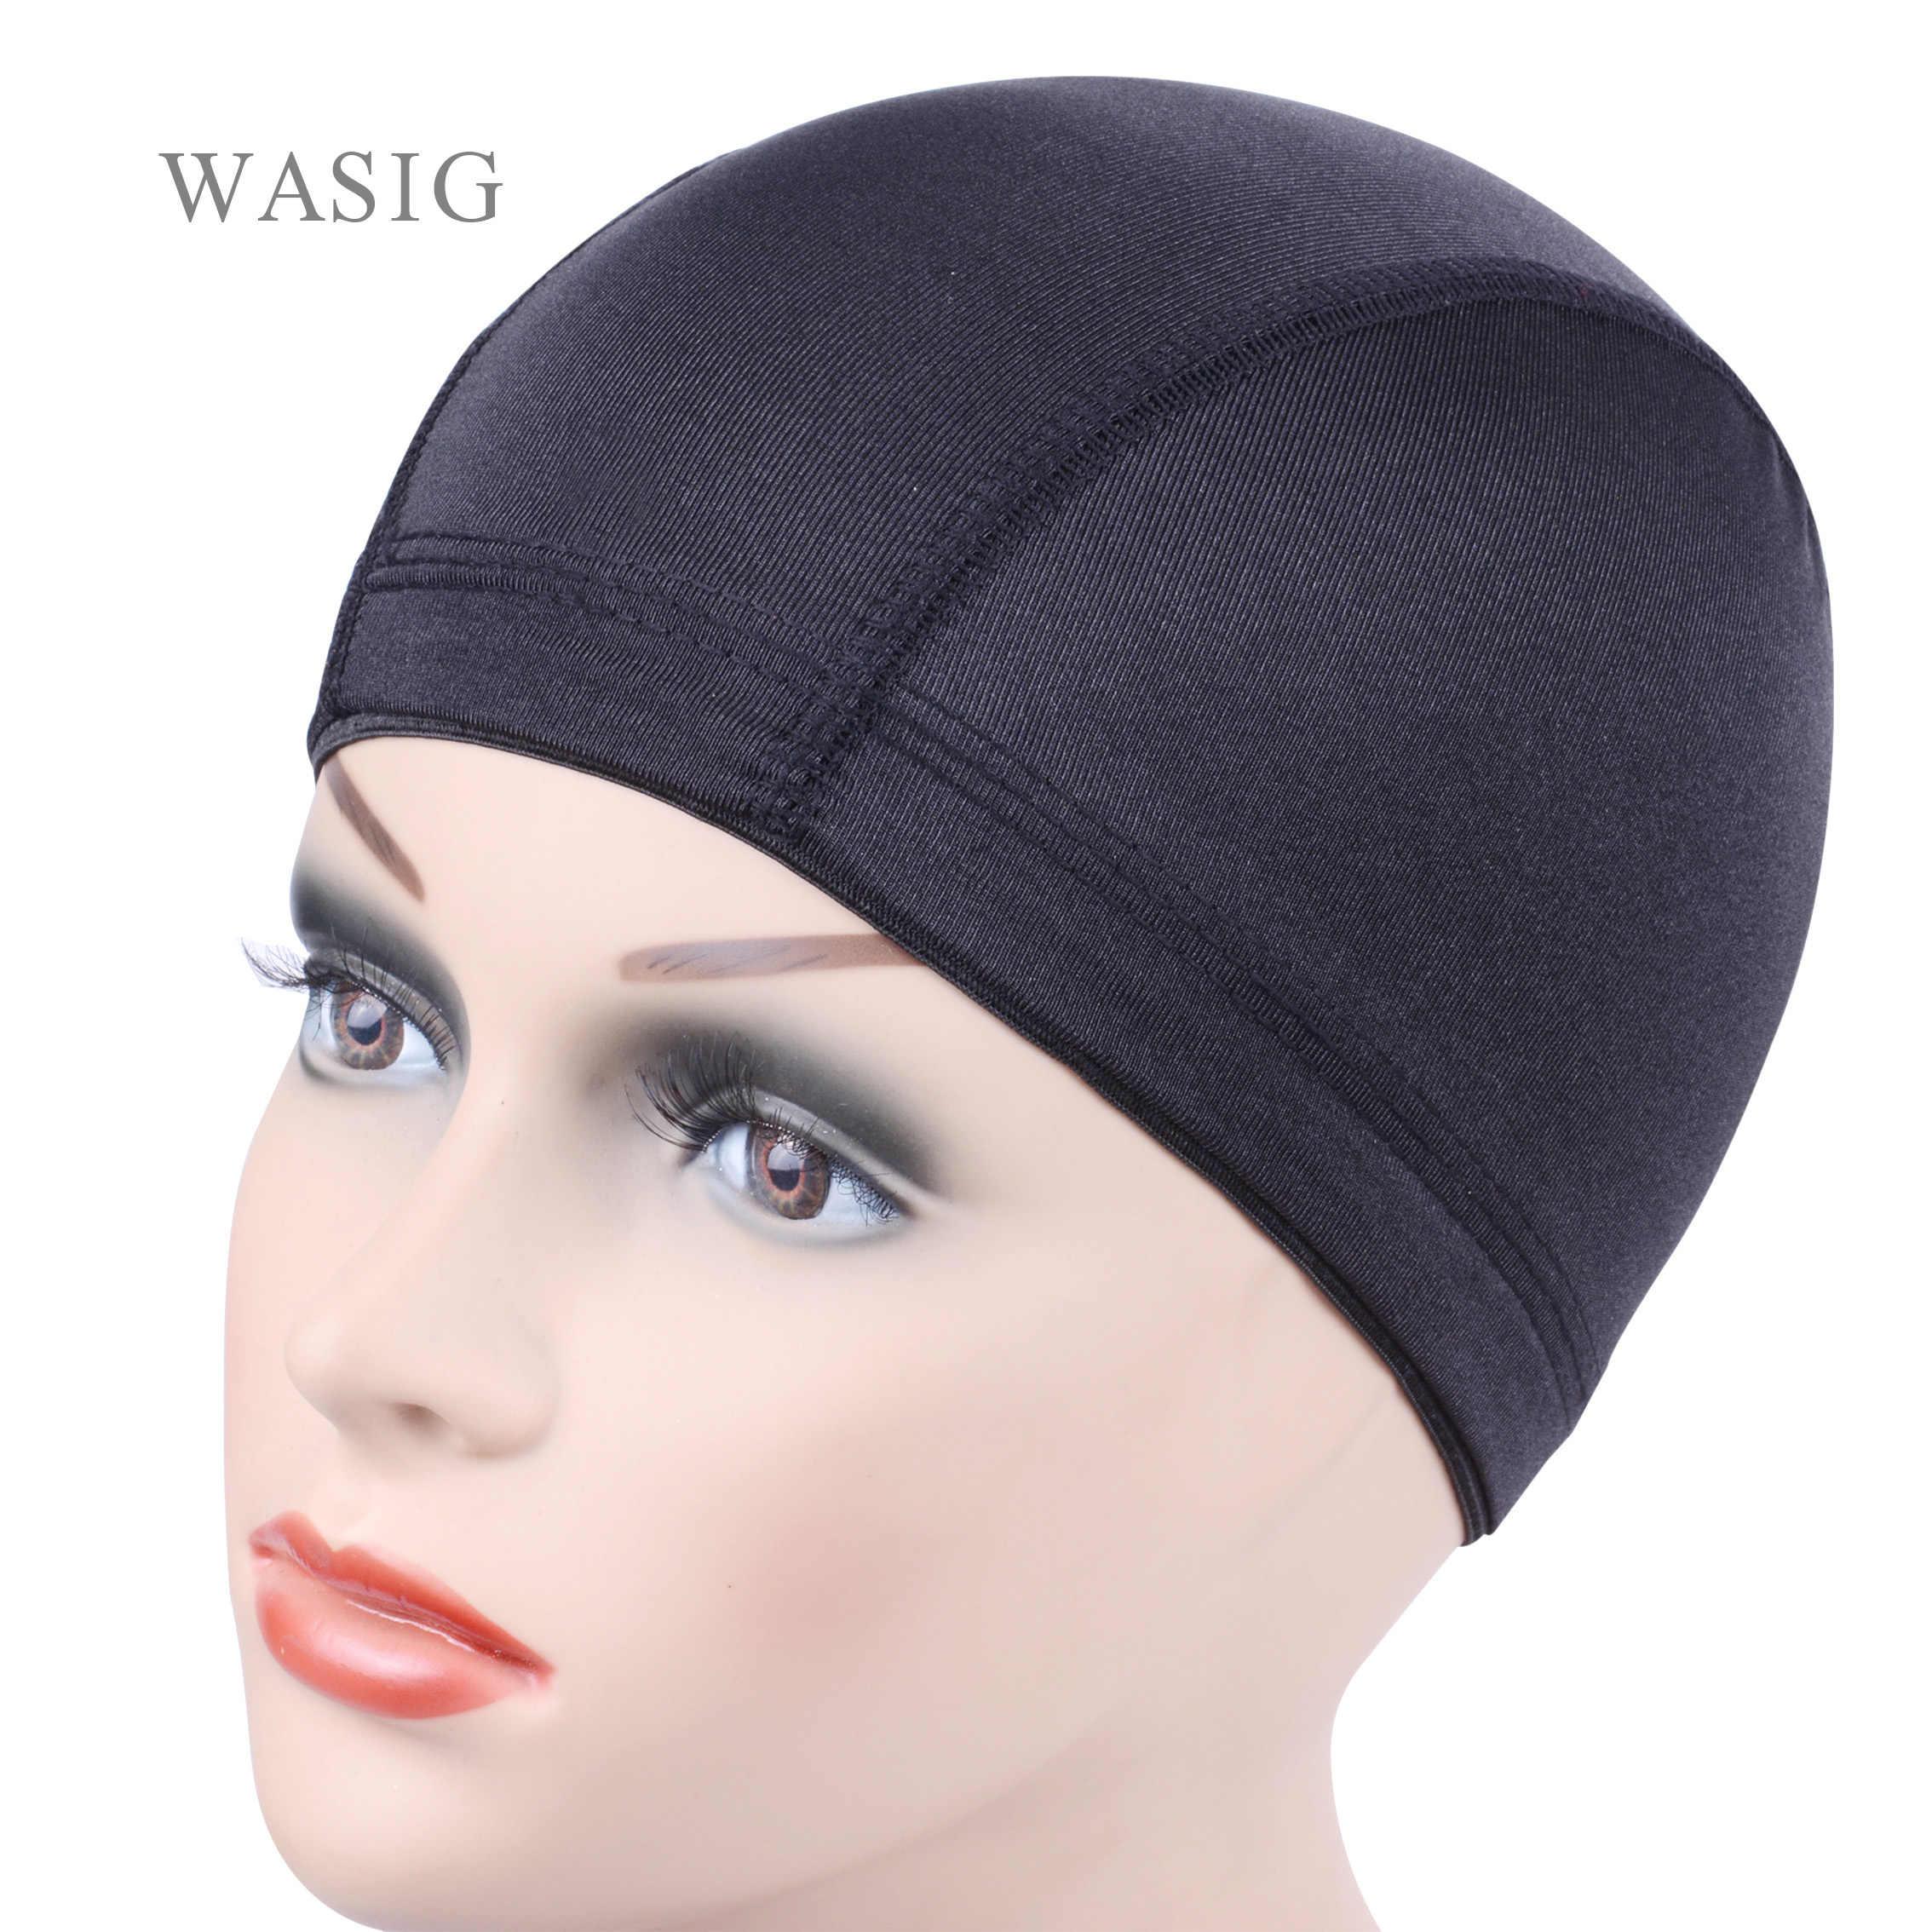 1 adet tutkalsız saç net peruk kap peruk yapımı İçin Spandex Net elastik kubbe kapağı örgü kubbe kapağı